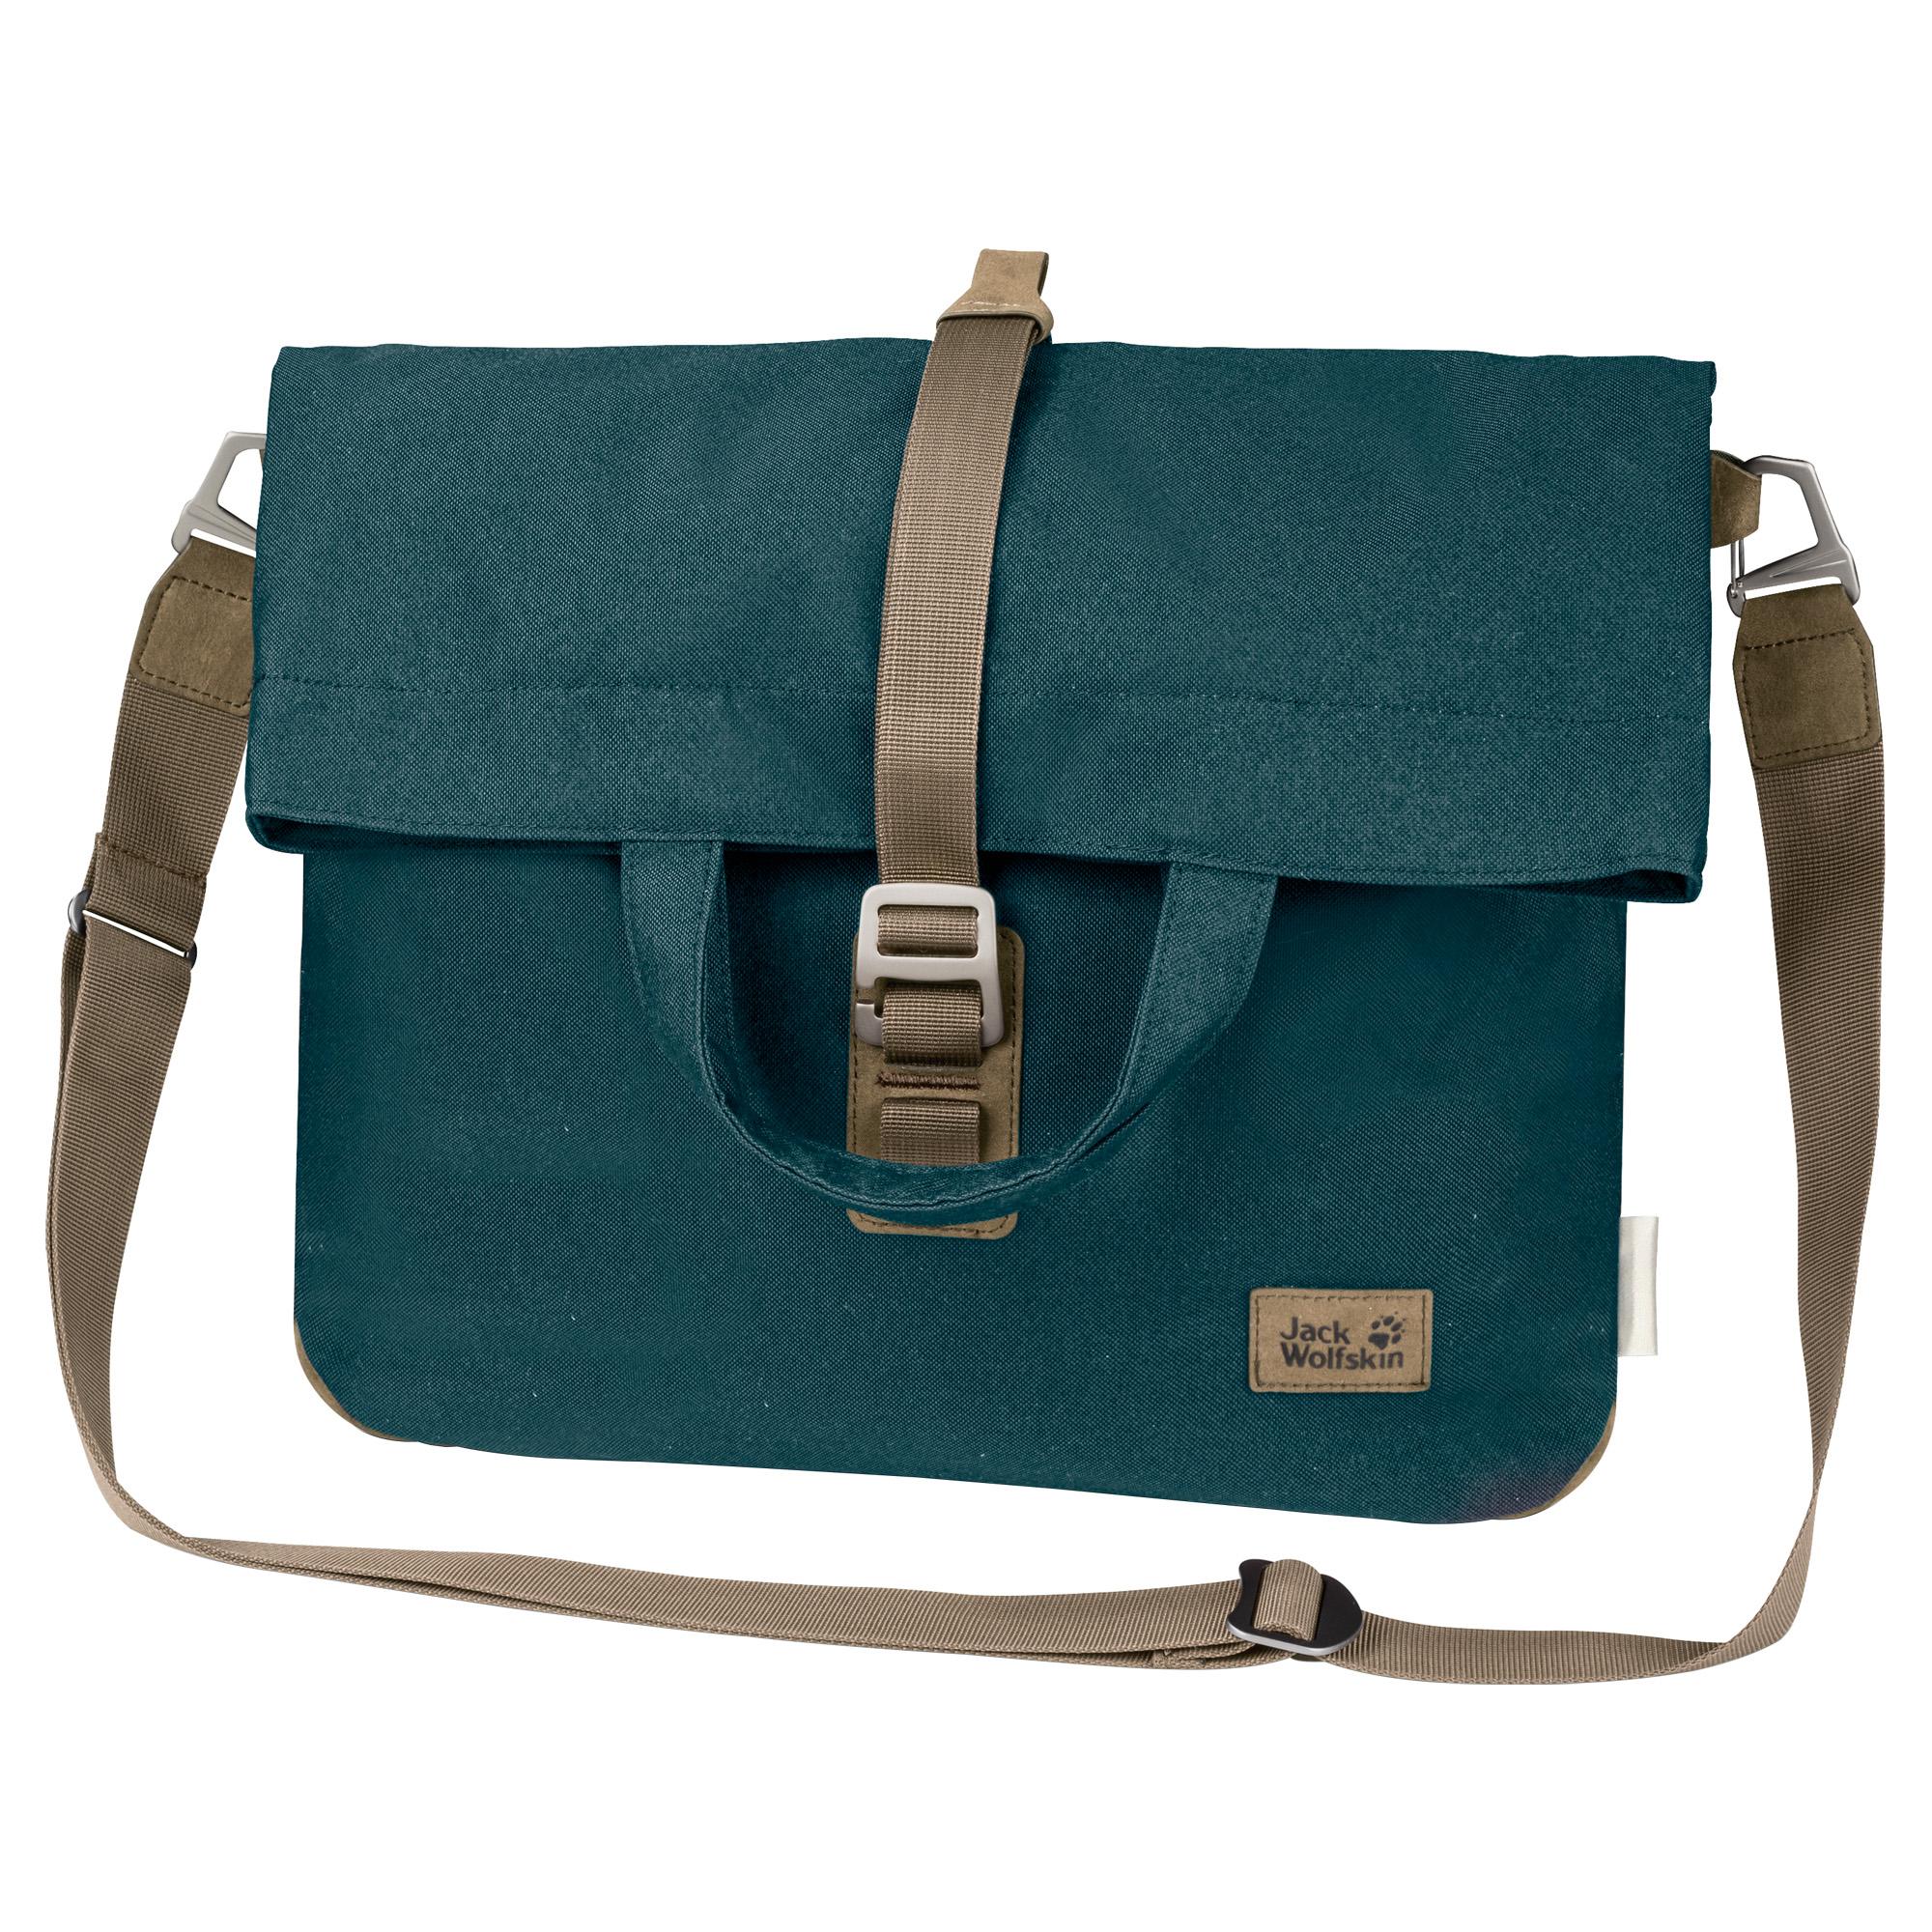 jack-wolfskin-soho-ride-bag-umh-auml-ngetasche-farbe-4041-teal-green-